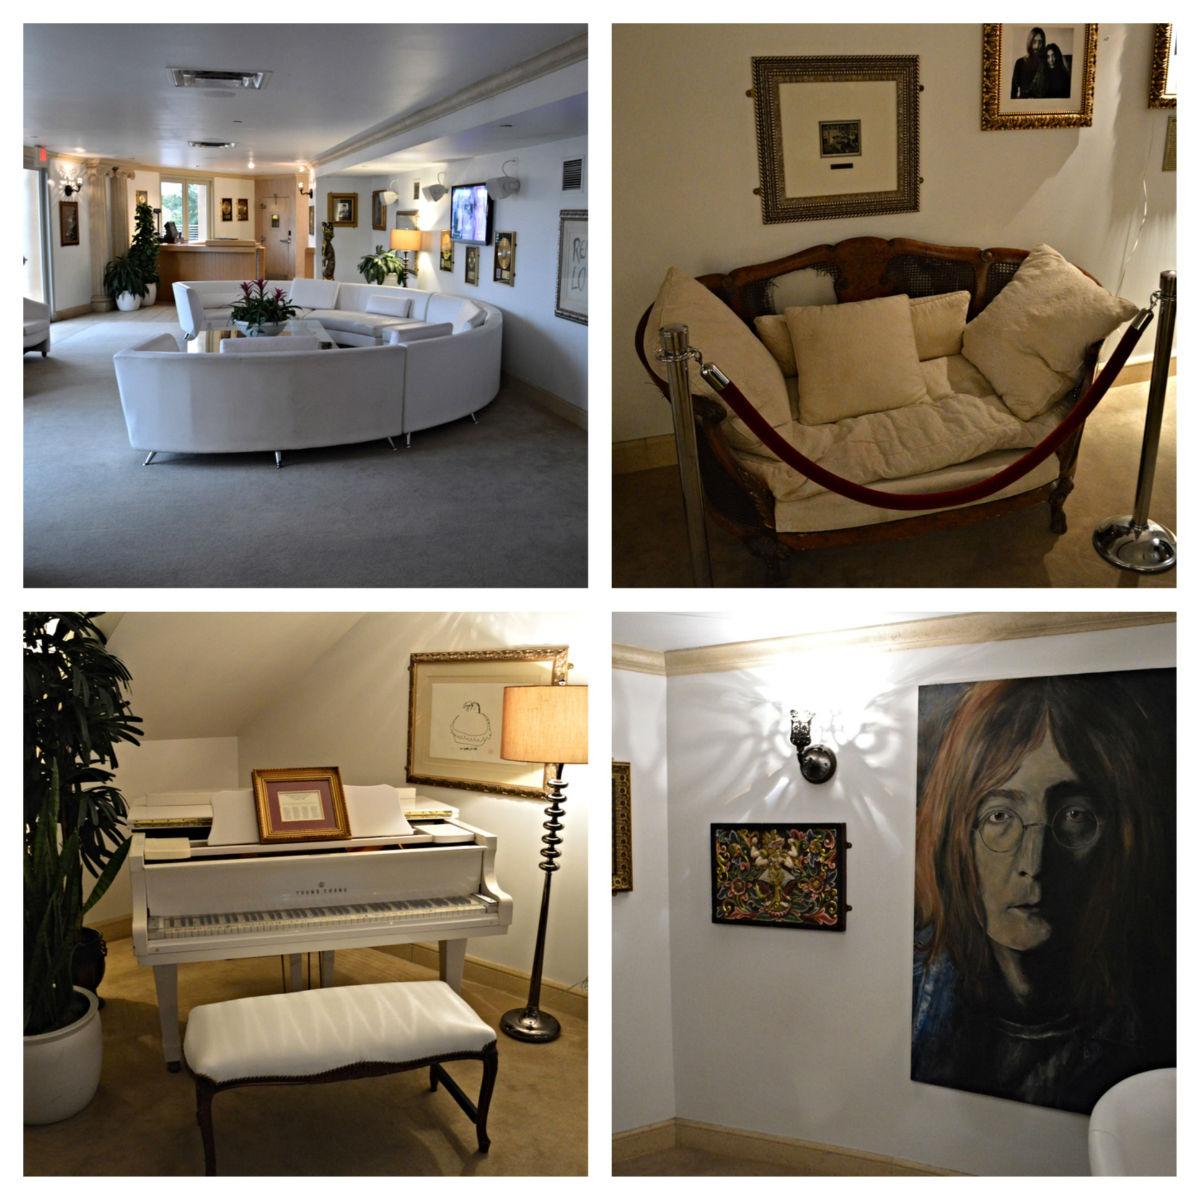 Hard Rock Cafe Orlando John Lennon Room